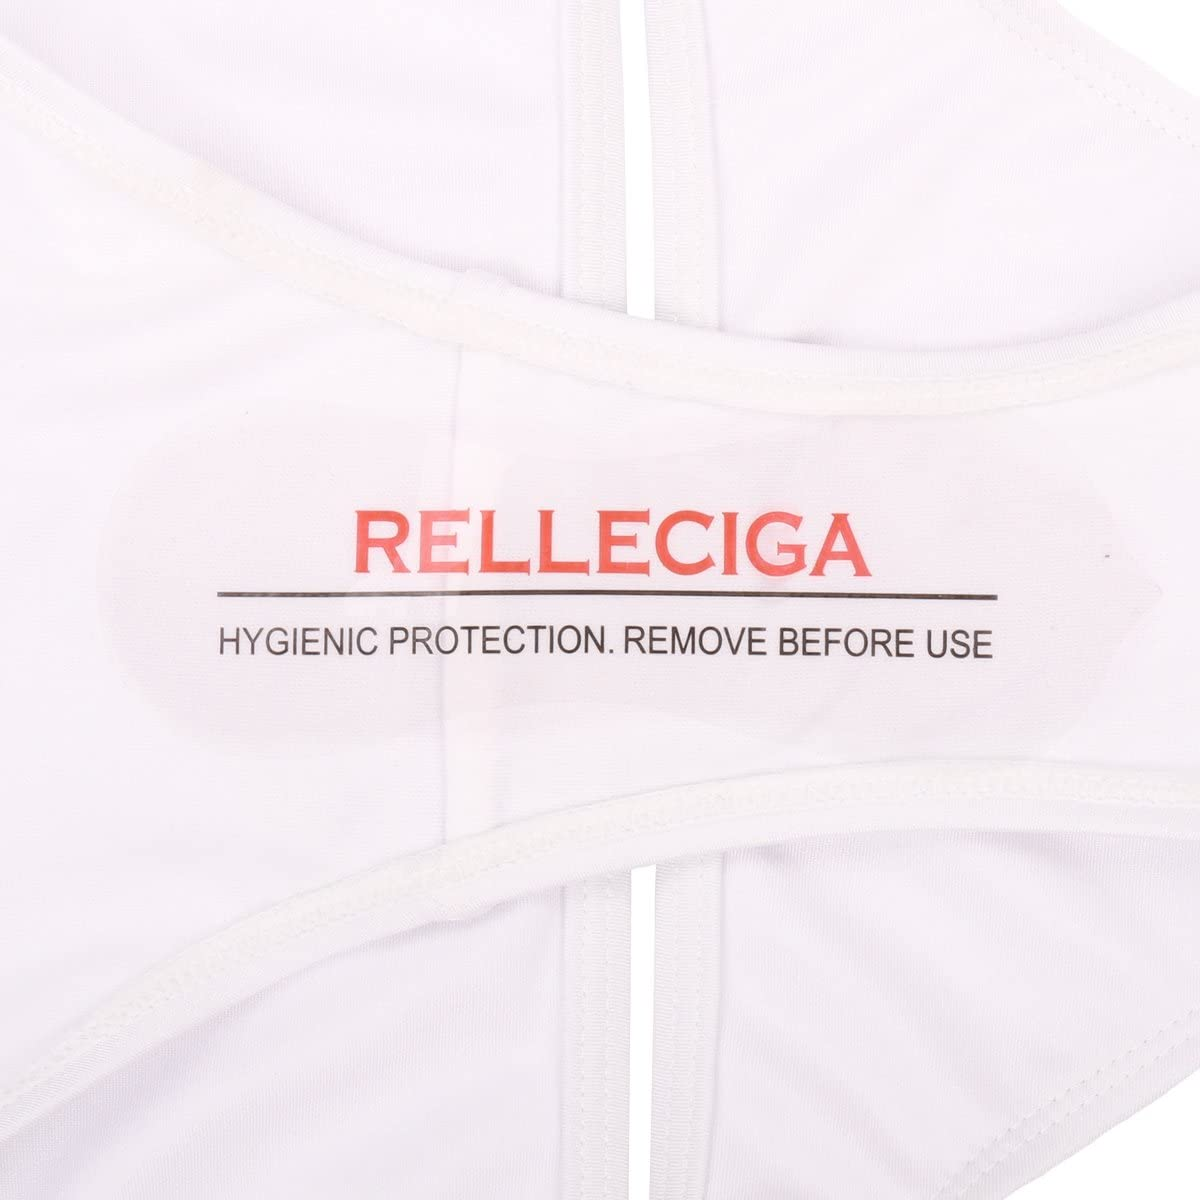 RELLECIGA Halter Black Push-up Swimwear with Criss Cross Triangle Top & Double-String Bottom White